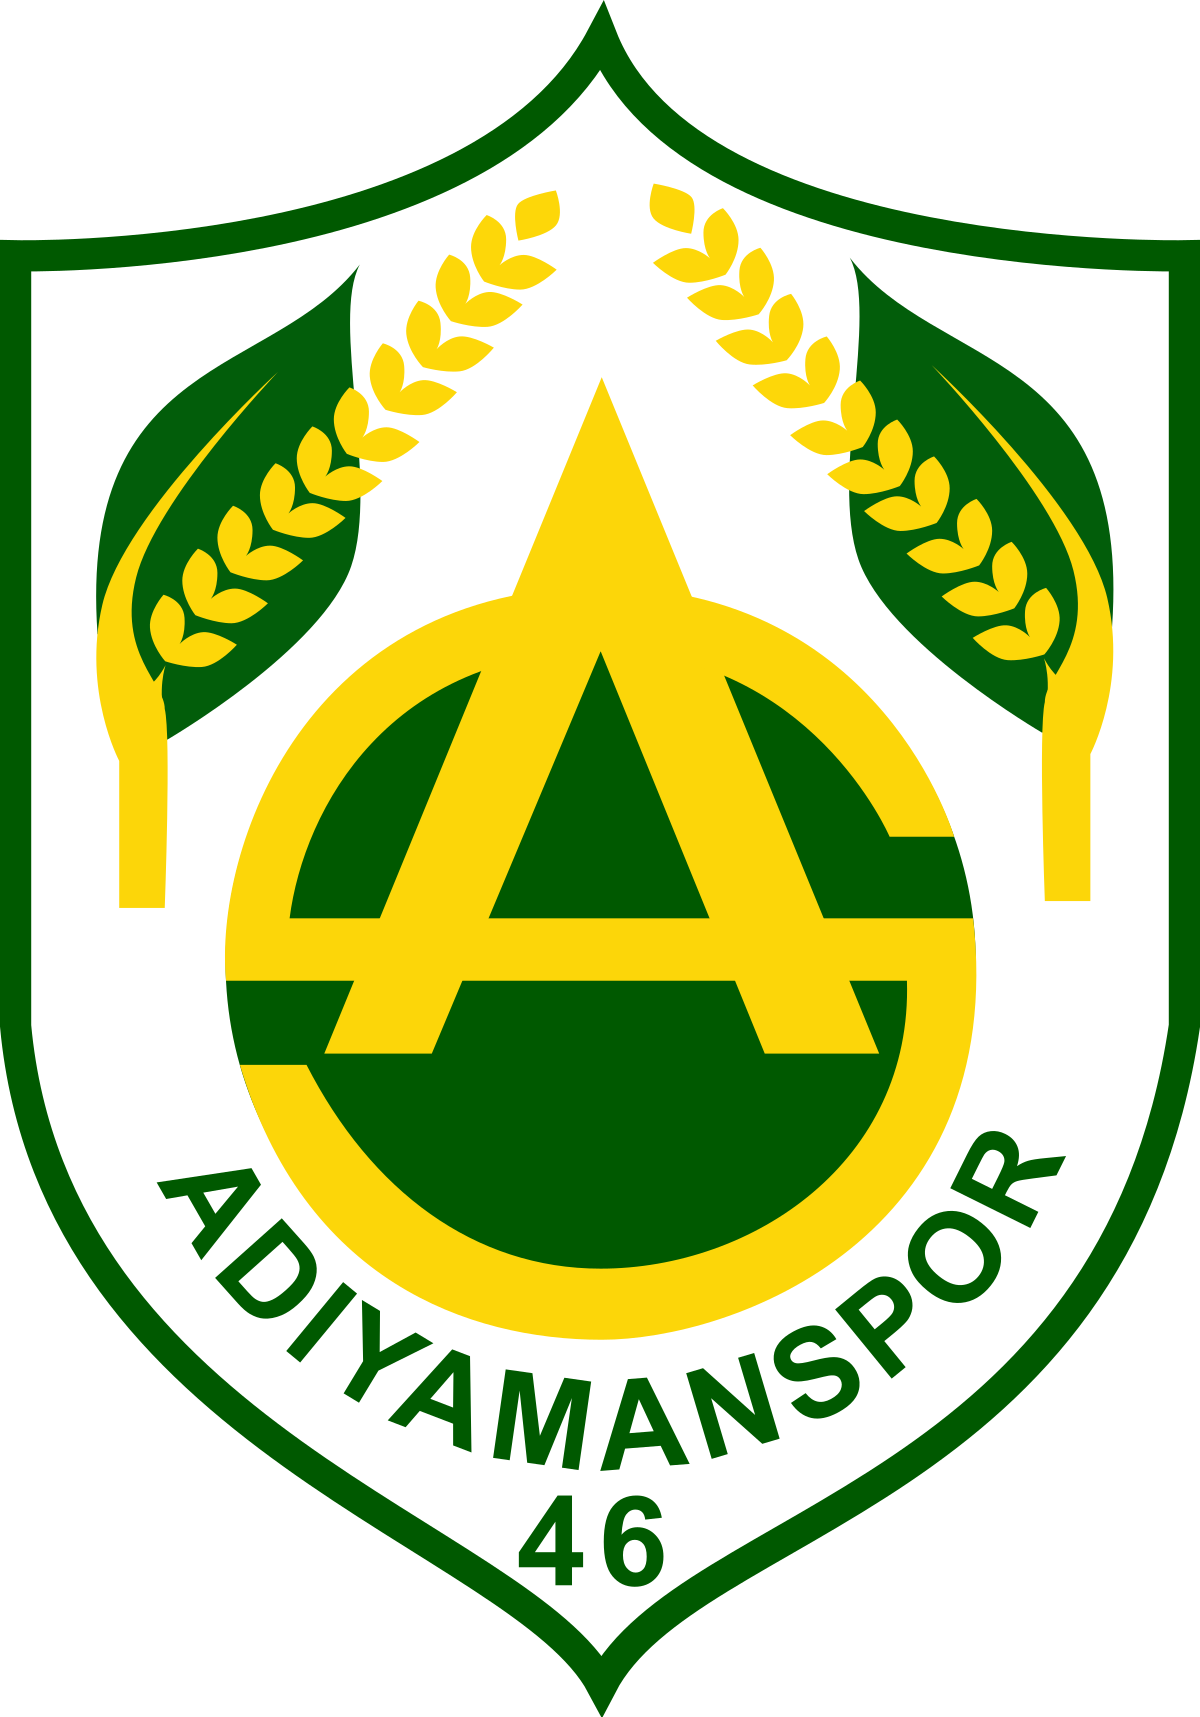 Adiyamanspor logo